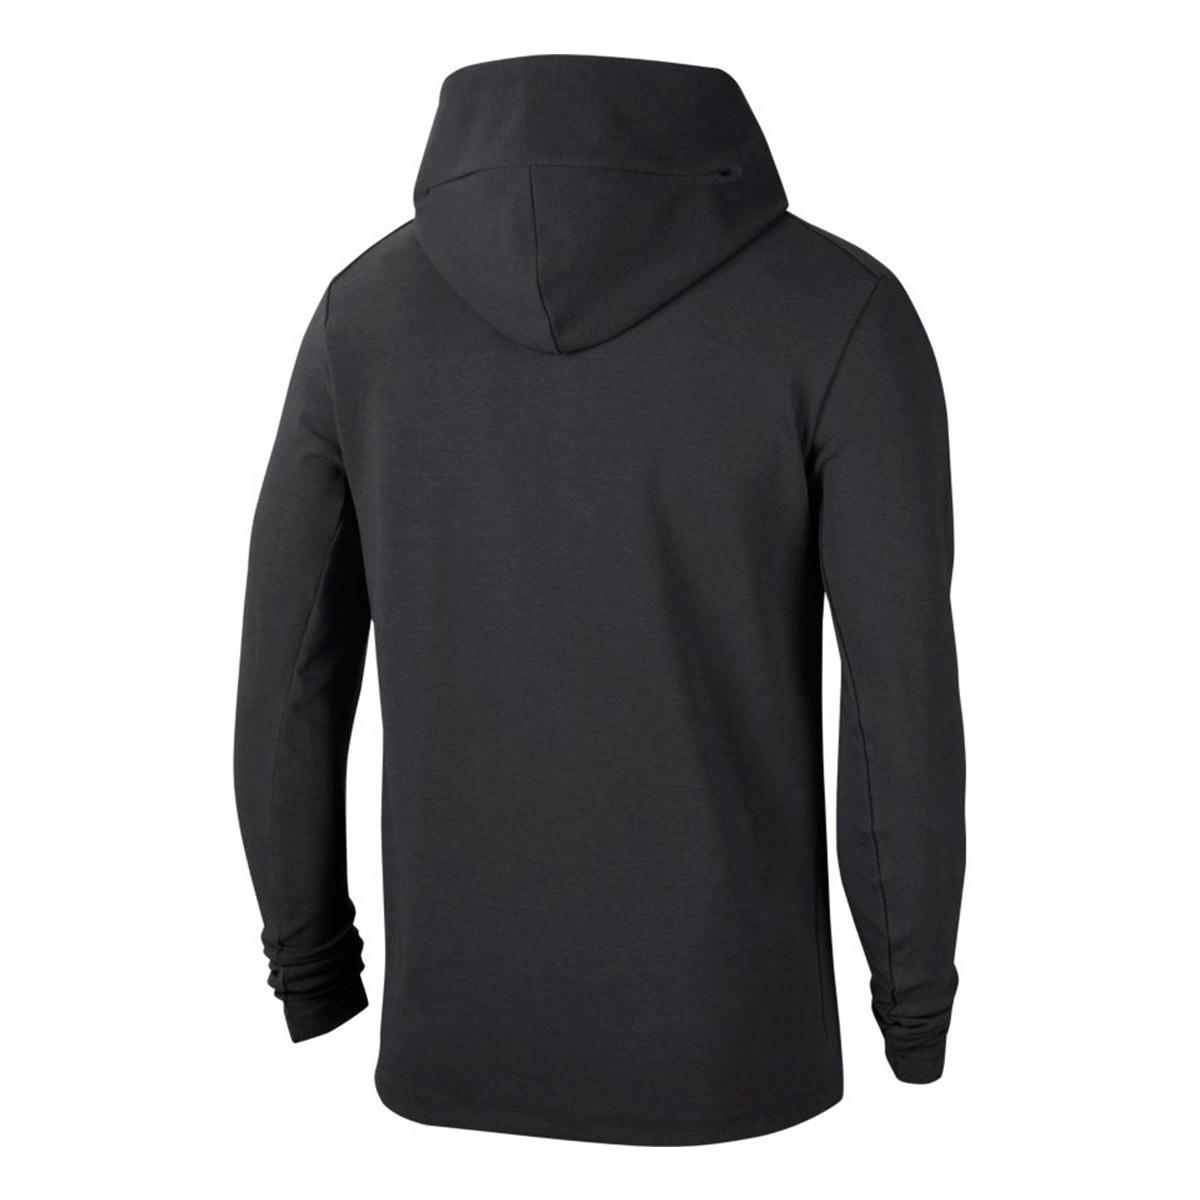 Nike FC Barcelona NSW Tech Hoodie FZ CL 2019 2020 Sweatshirt